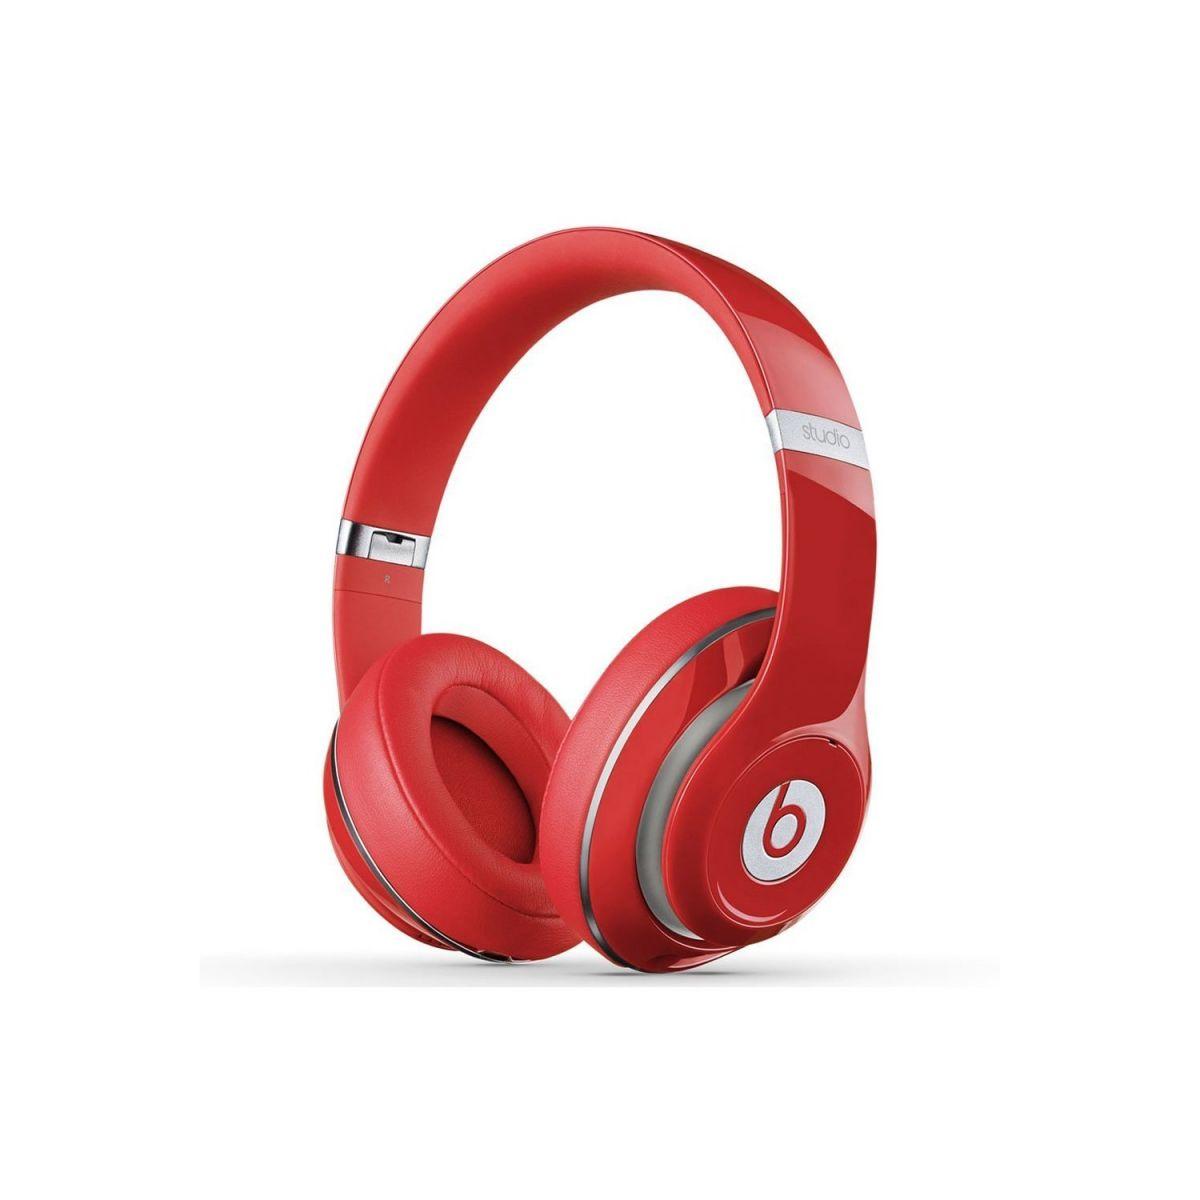 eatsstudio2.0新版录音师头戴式耳机